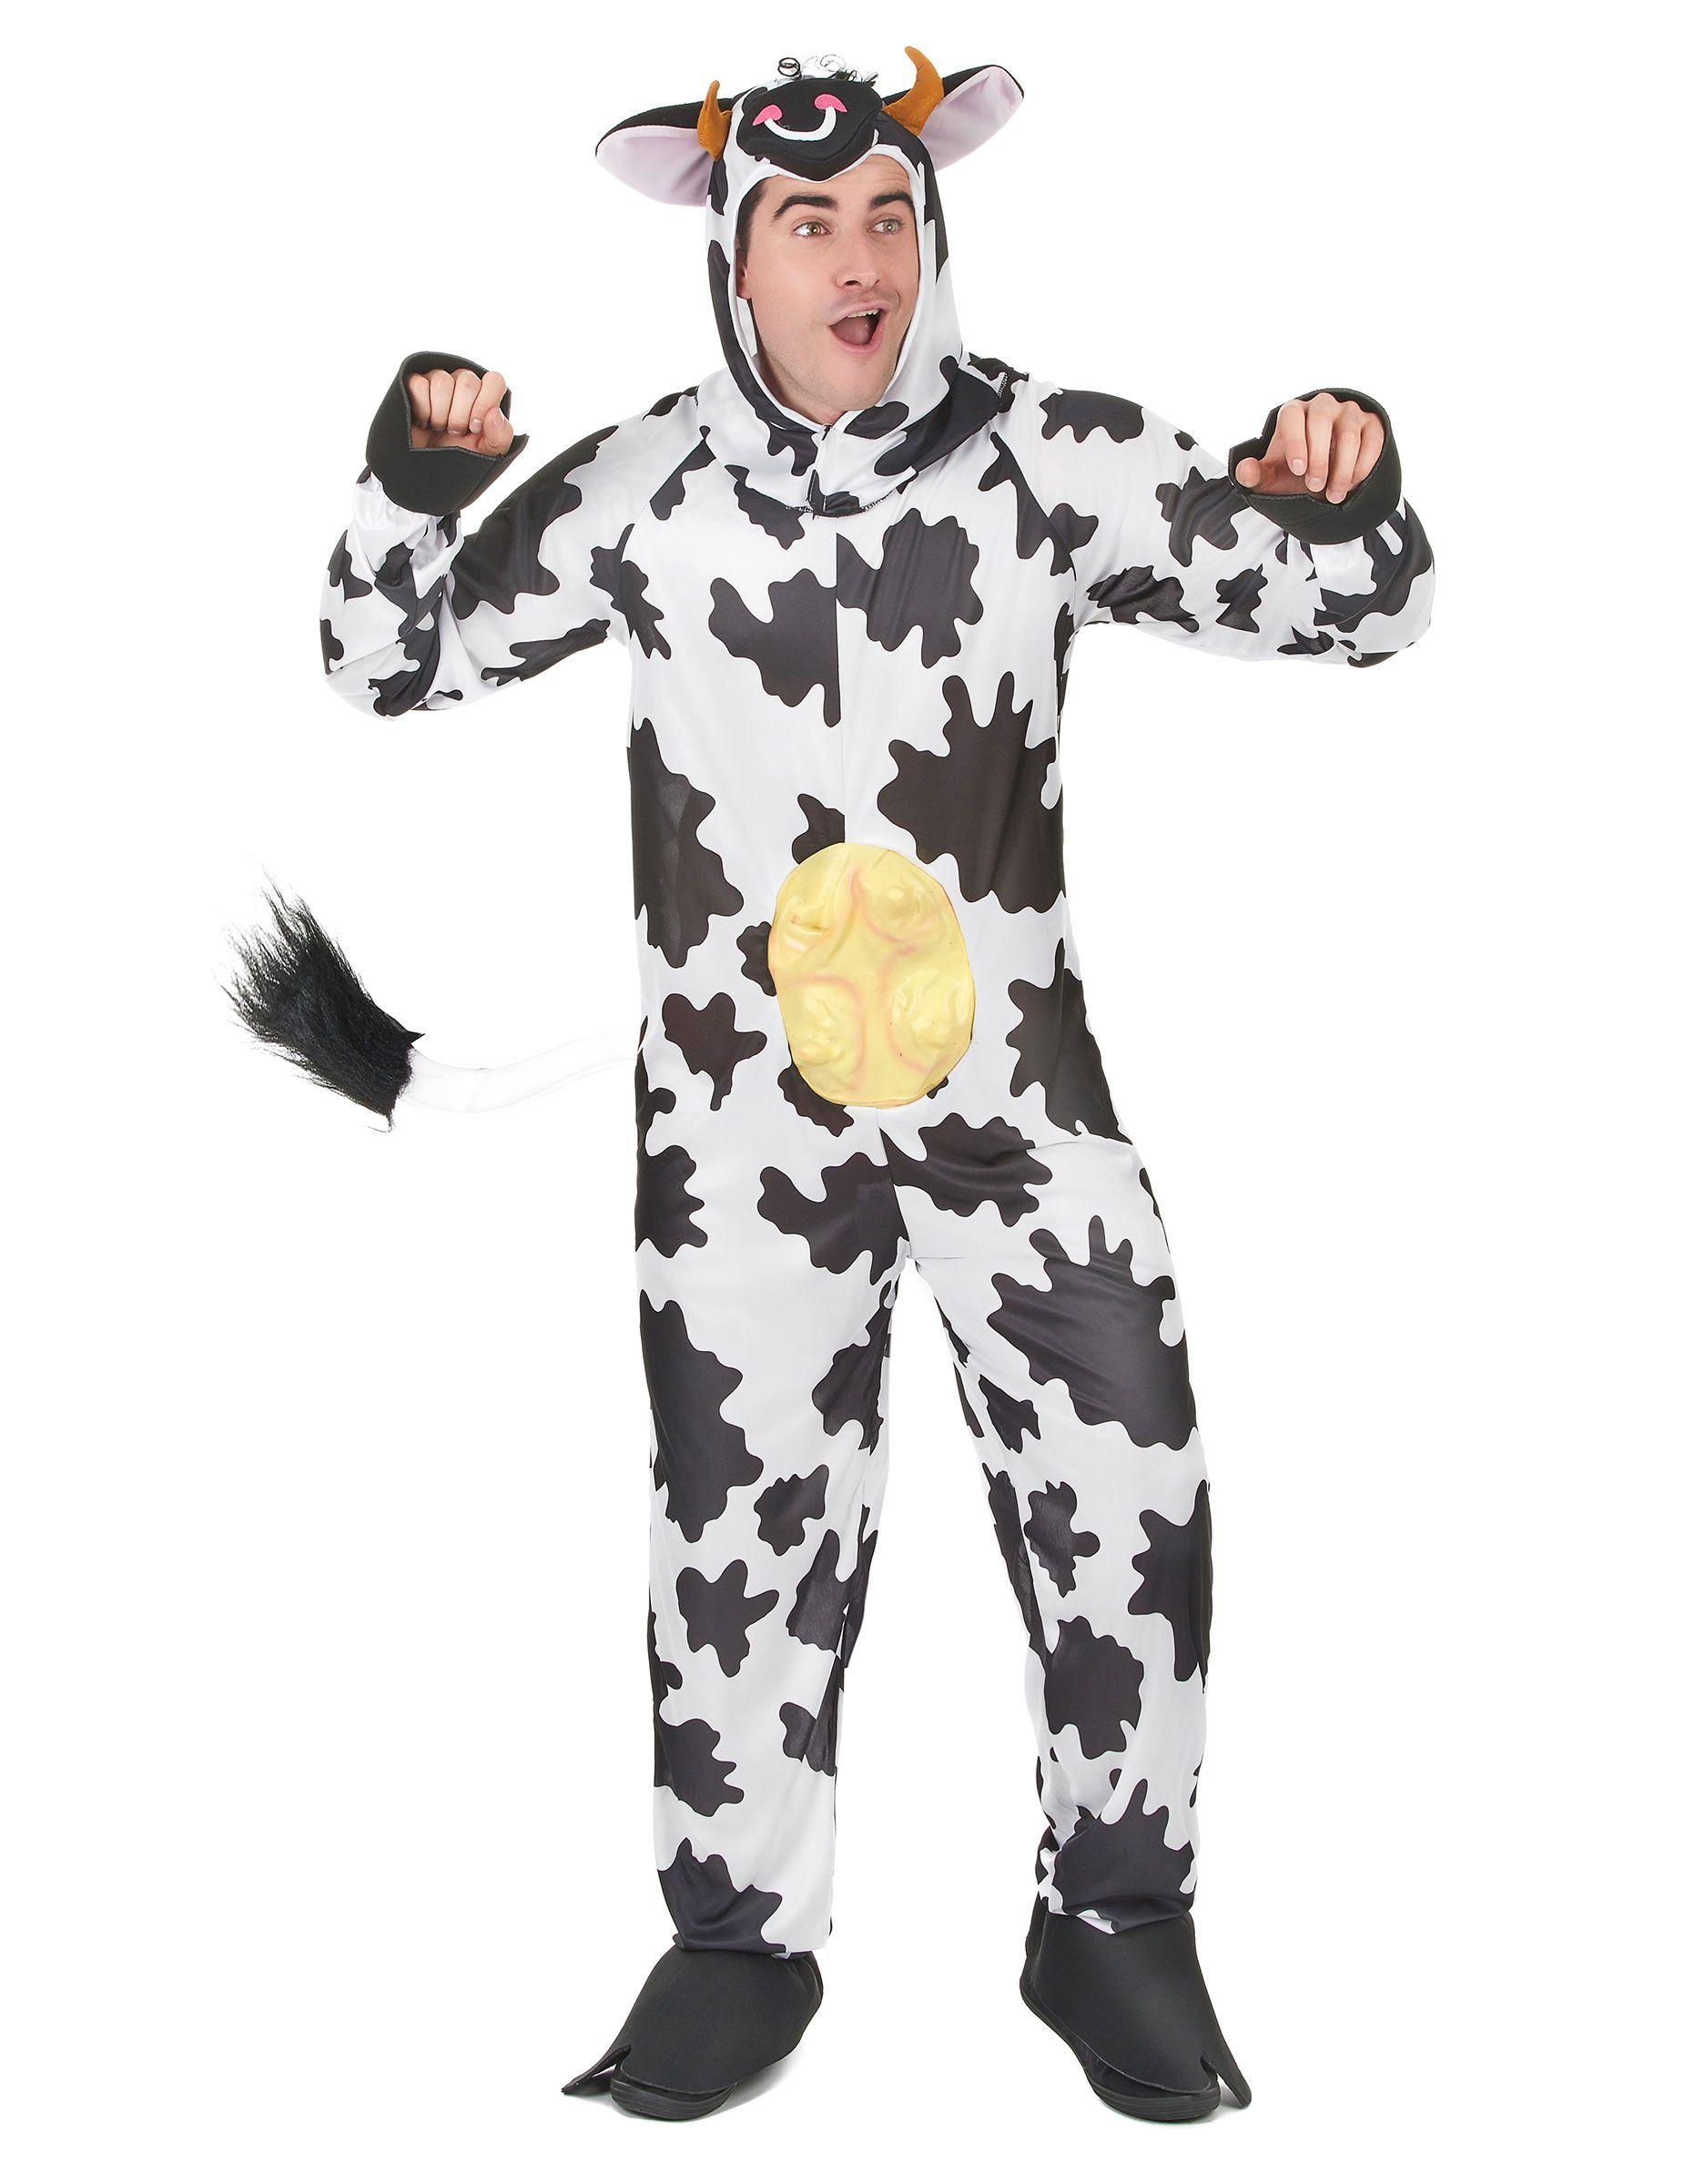 Tierkostüm singe costume overall singe pour homme drôle mardi Gras Costume Animal